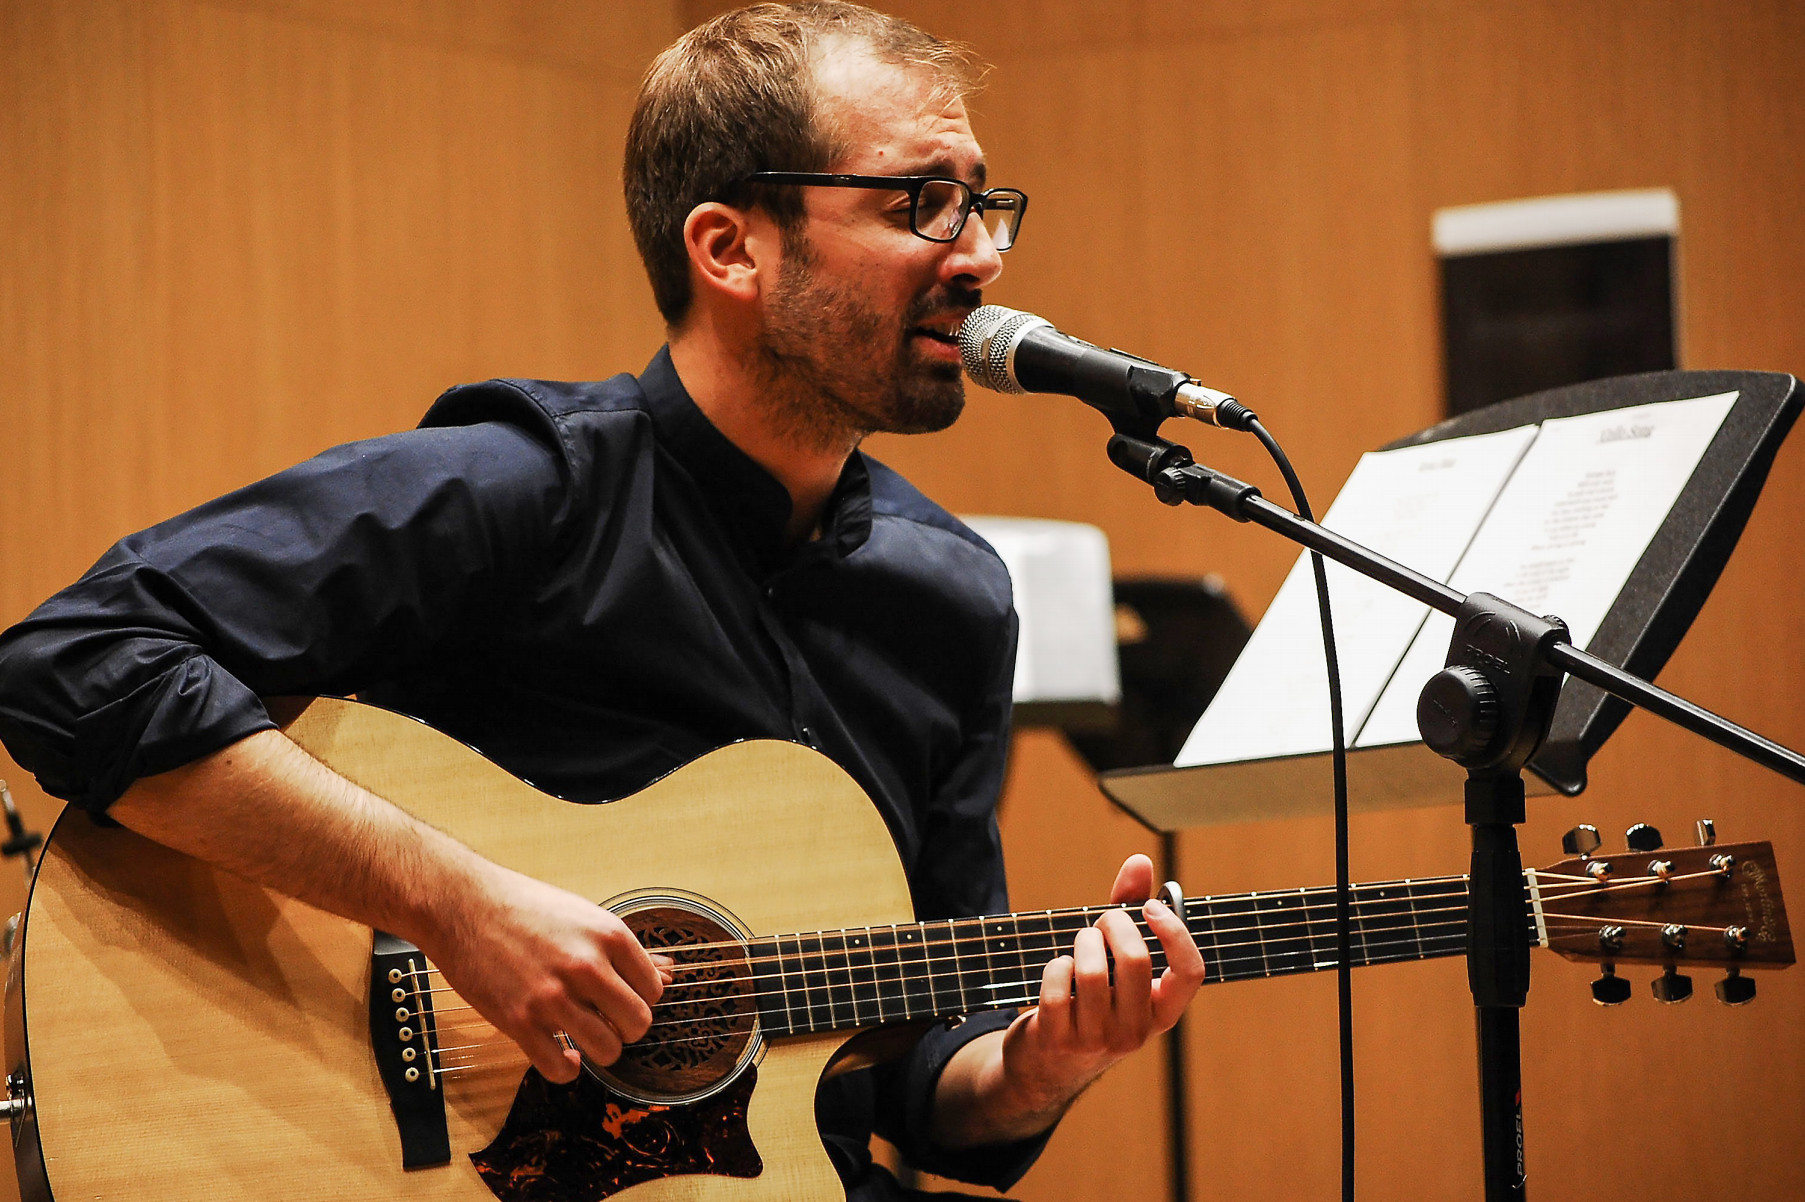 Stefano Tallini